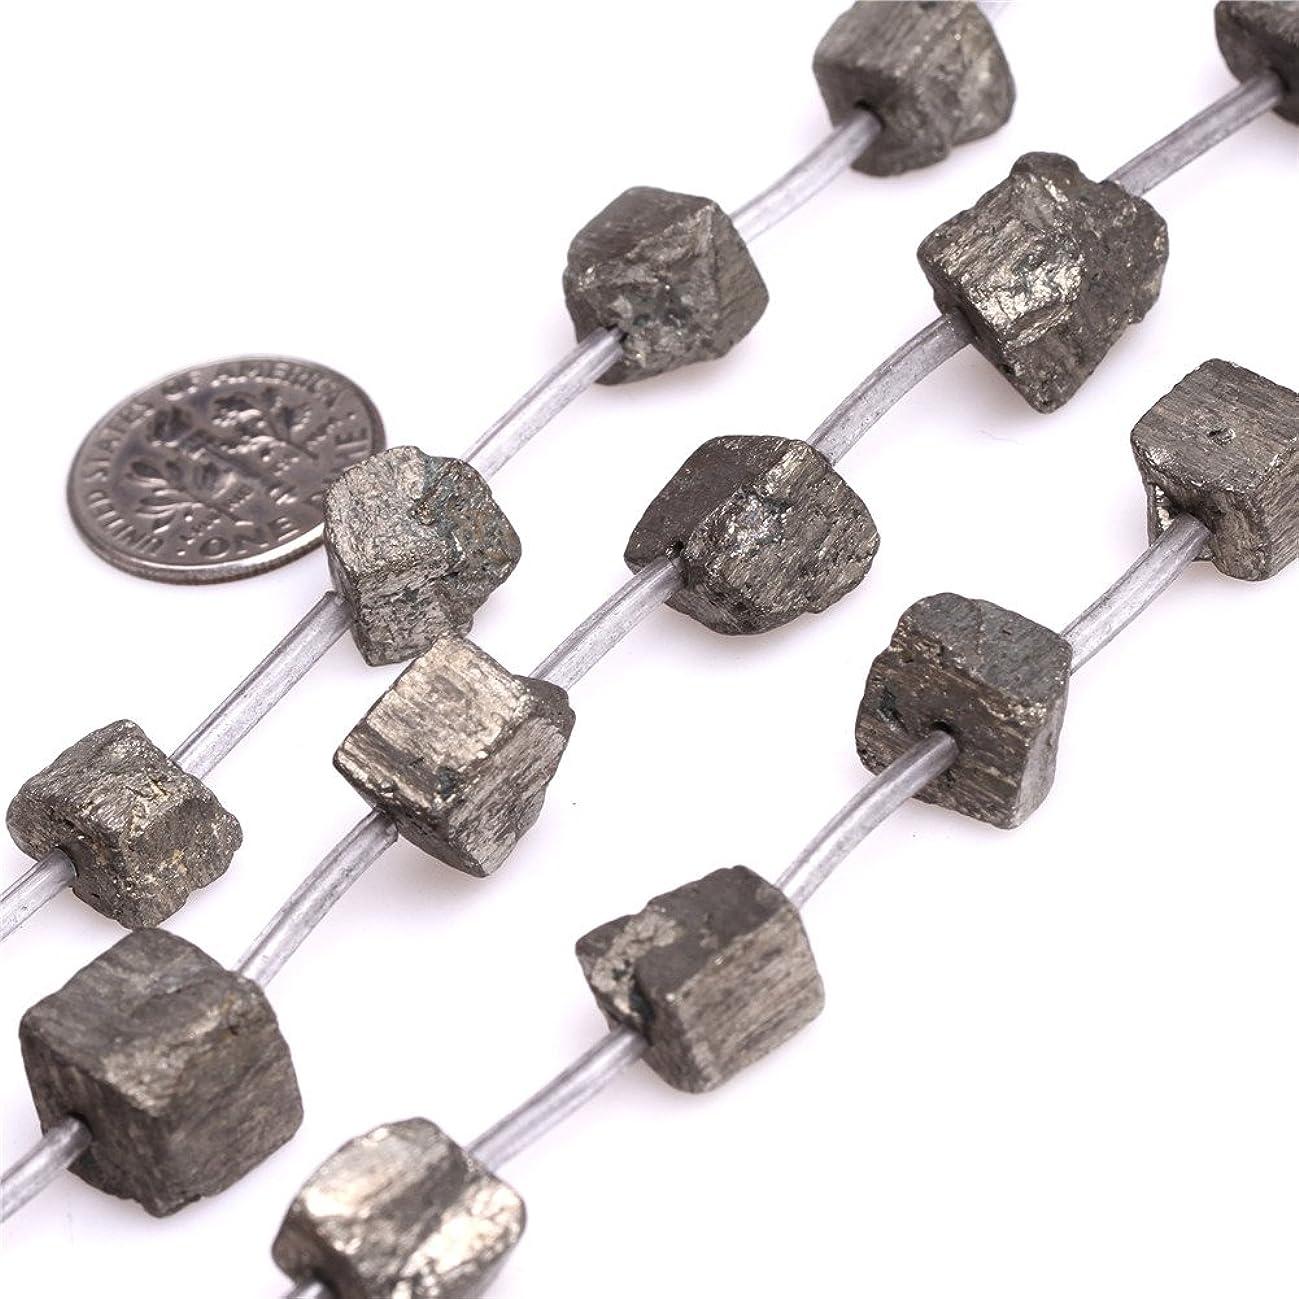 JOE FOREMAN 10mm Freeform Pyrite Semi Precious Gemstone Freeform Loose Beads for Jewelry Making DIY Handmade Craft Supplies 15